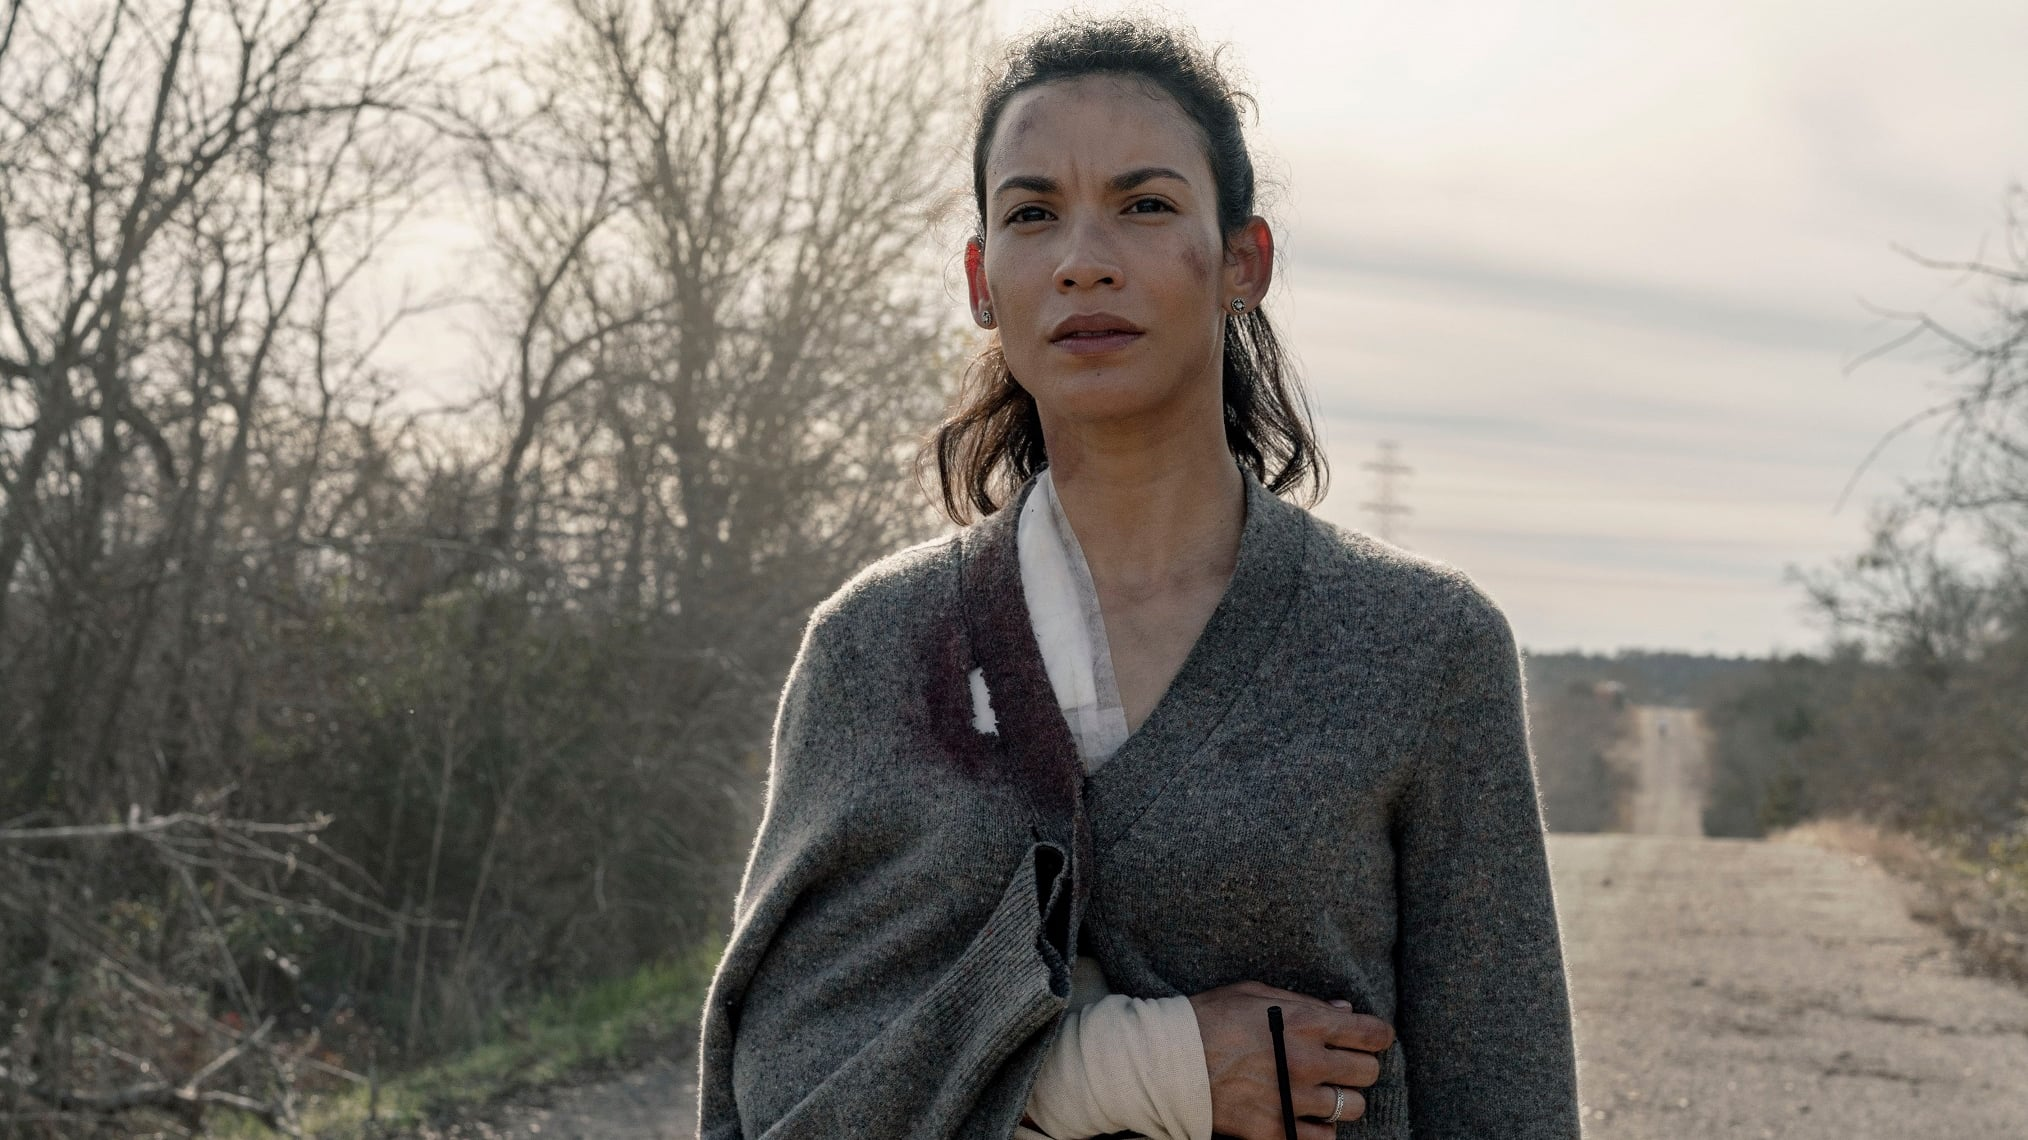 Nonton Fear the Walking Dead: Season 5 Episode 3 - Humbug ...